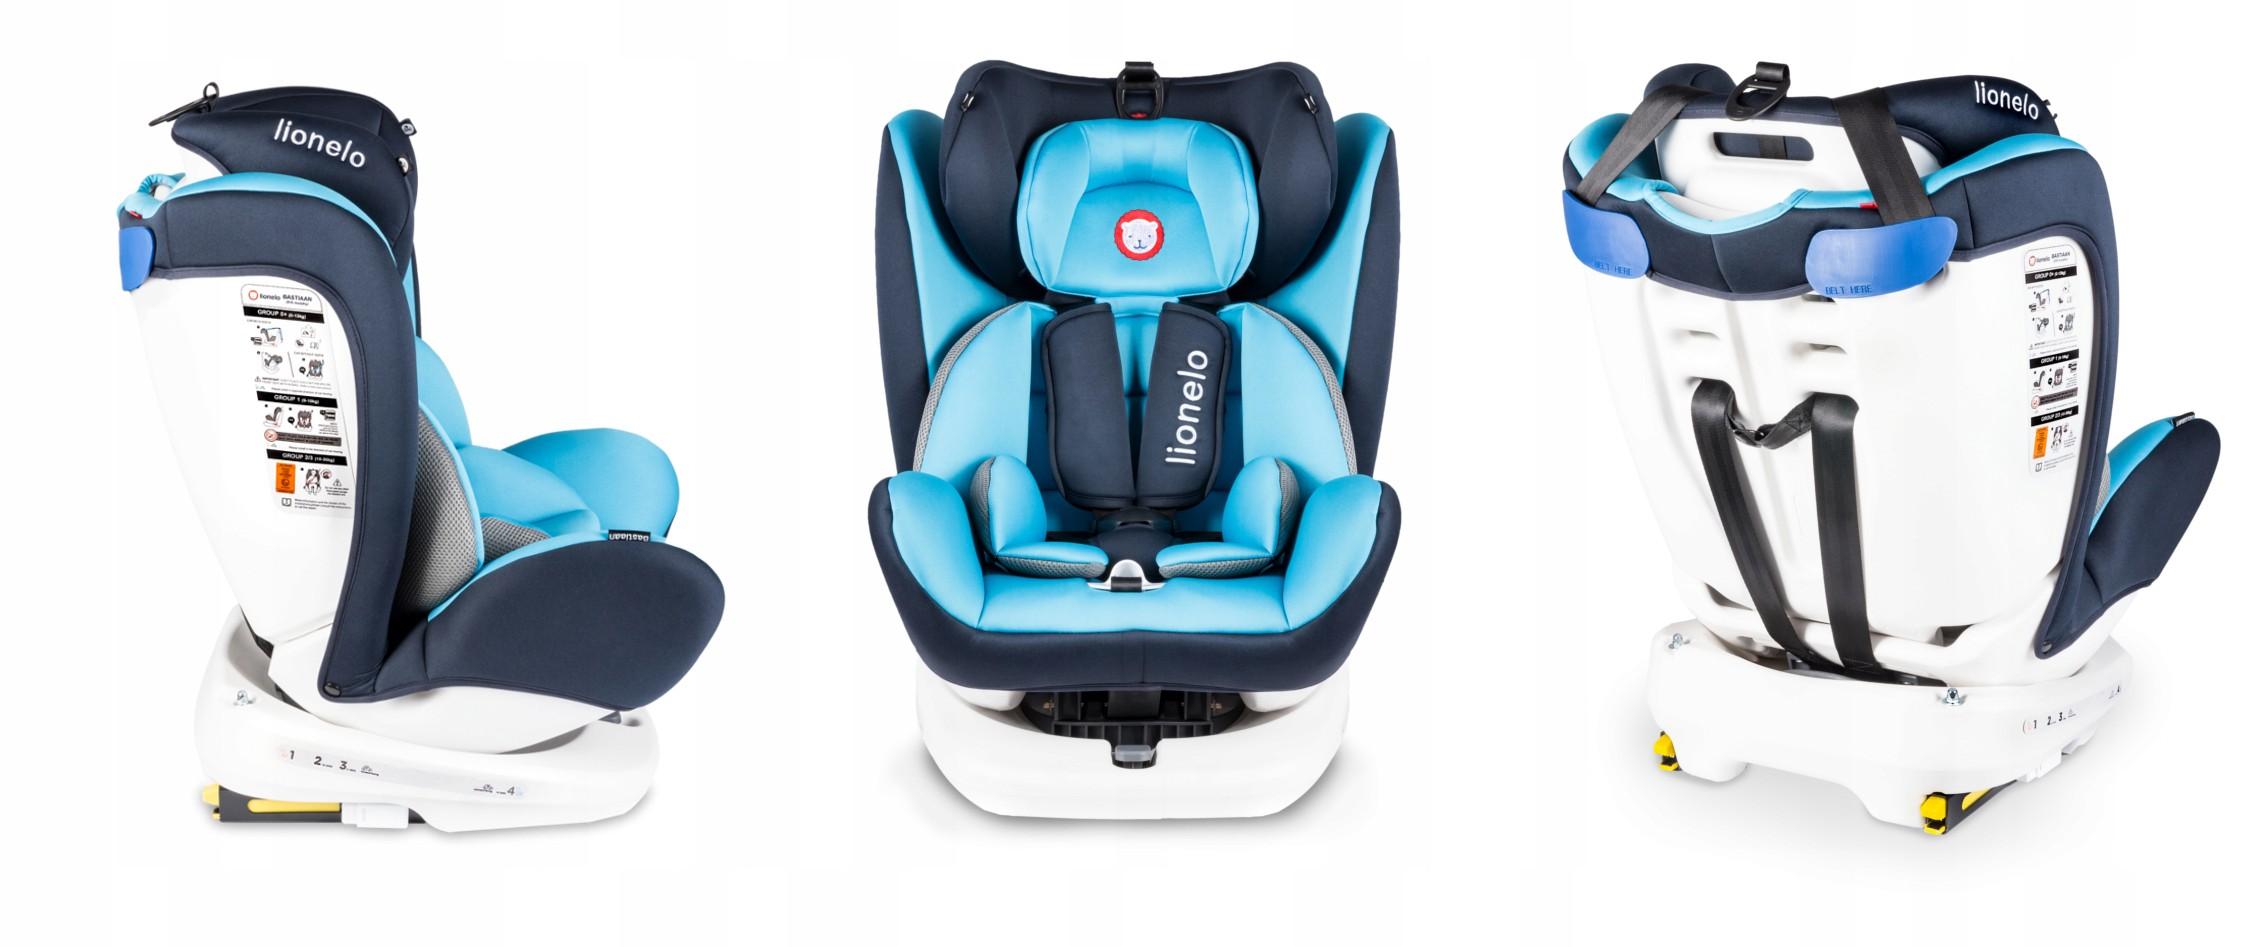 Lionelo-Bastiaan-360-Auto-Kindersitz-Autositz-ISOFIX-9-36Kg-Gruppe-0-1-2-3-TUV Indexbild 15